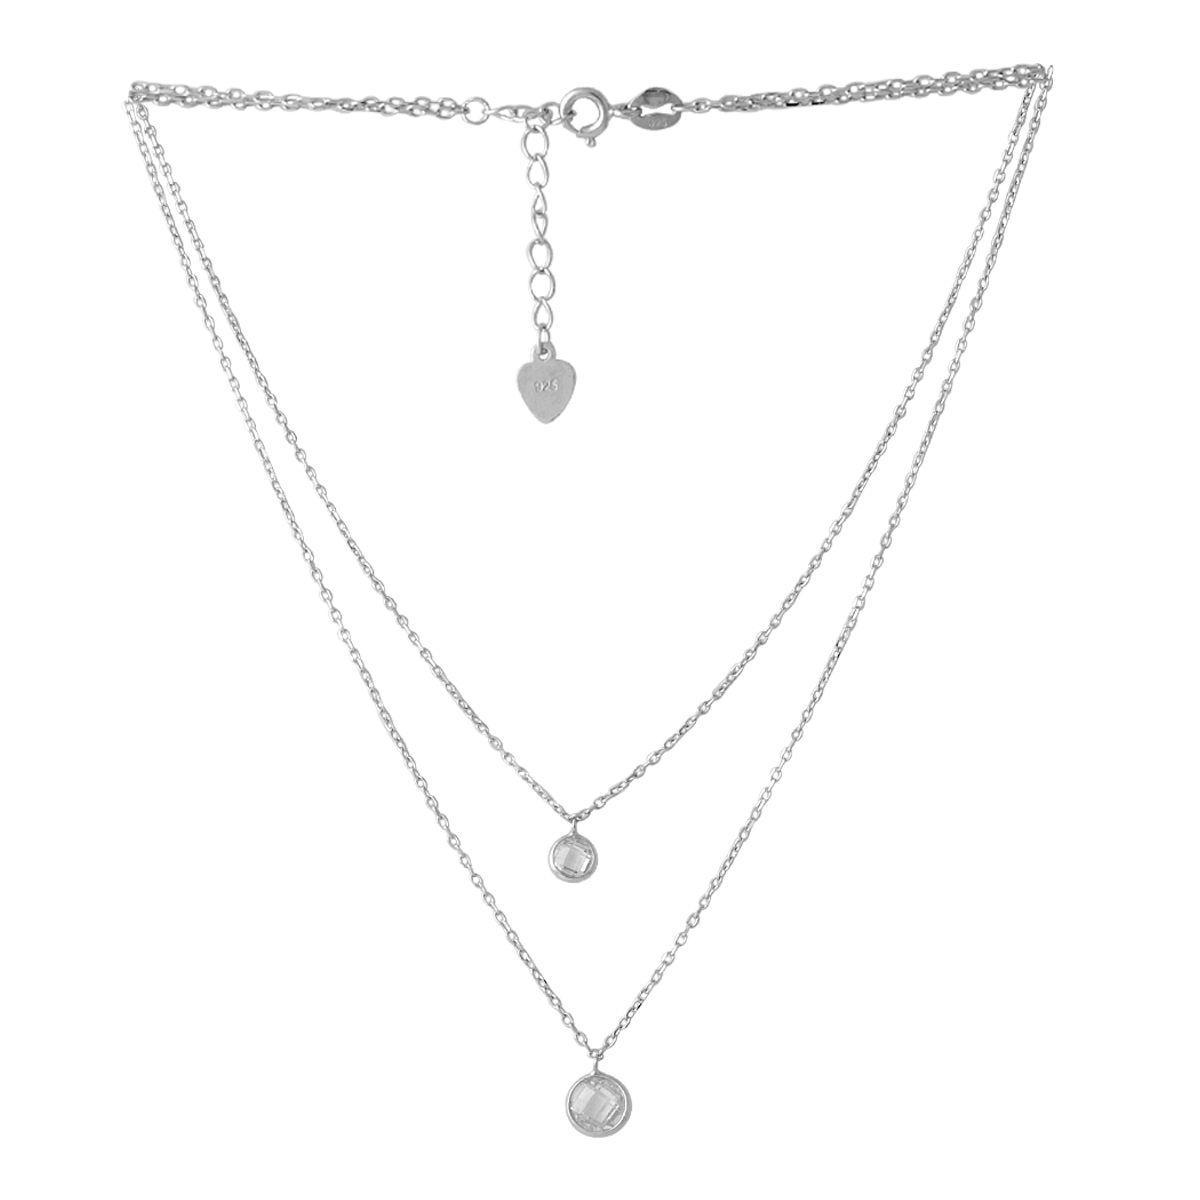 Серебряное колье DreamJewelry с фианитами (2052784) 450 размер